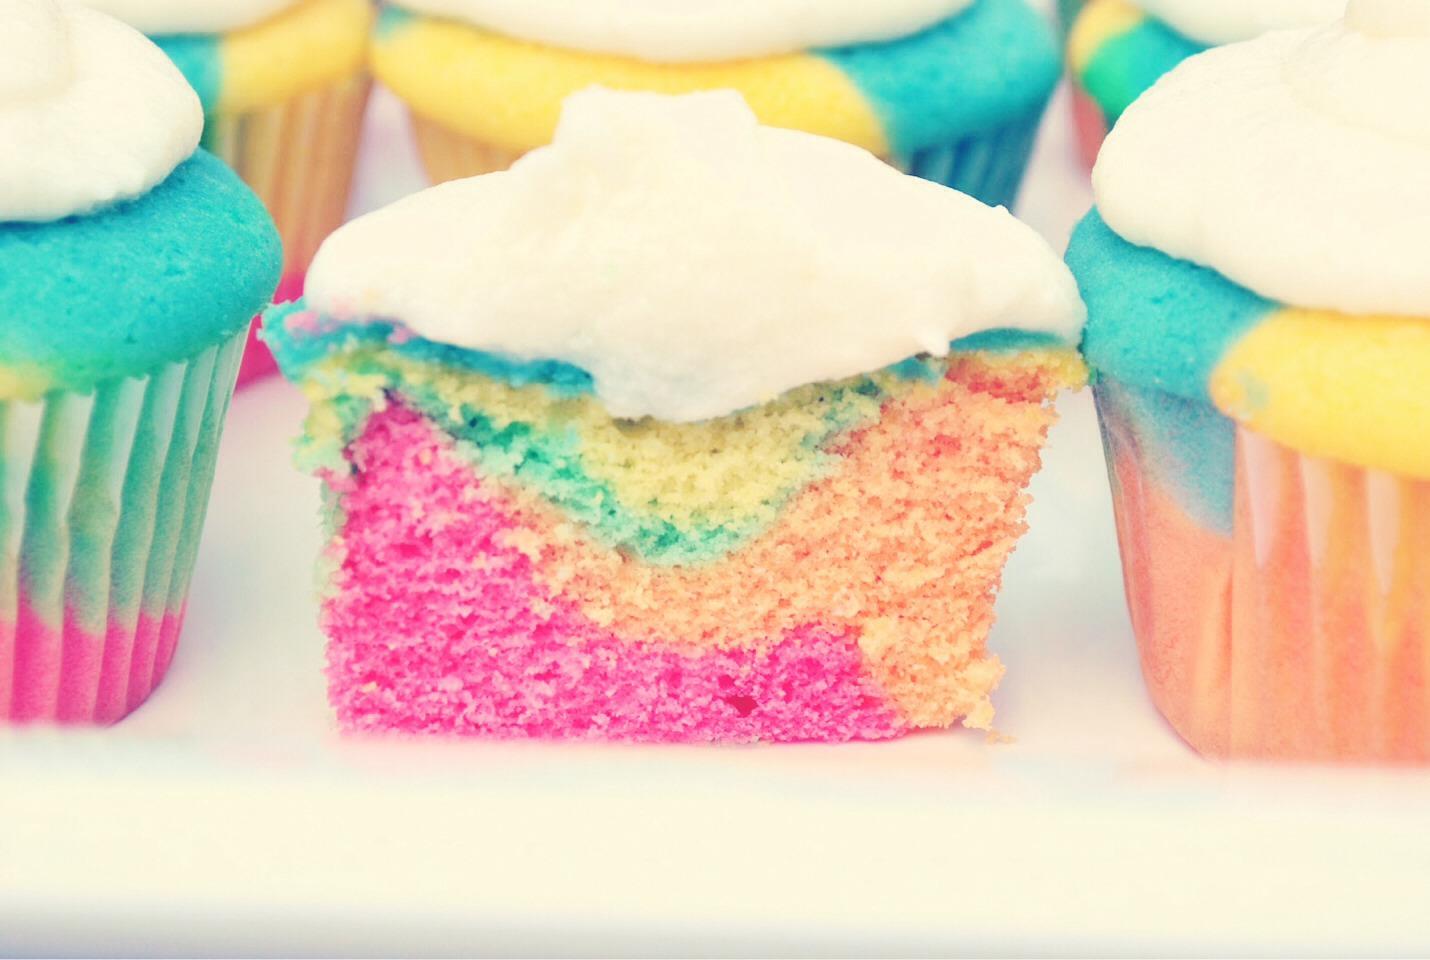 Tie Dye Food Coloring Recipes